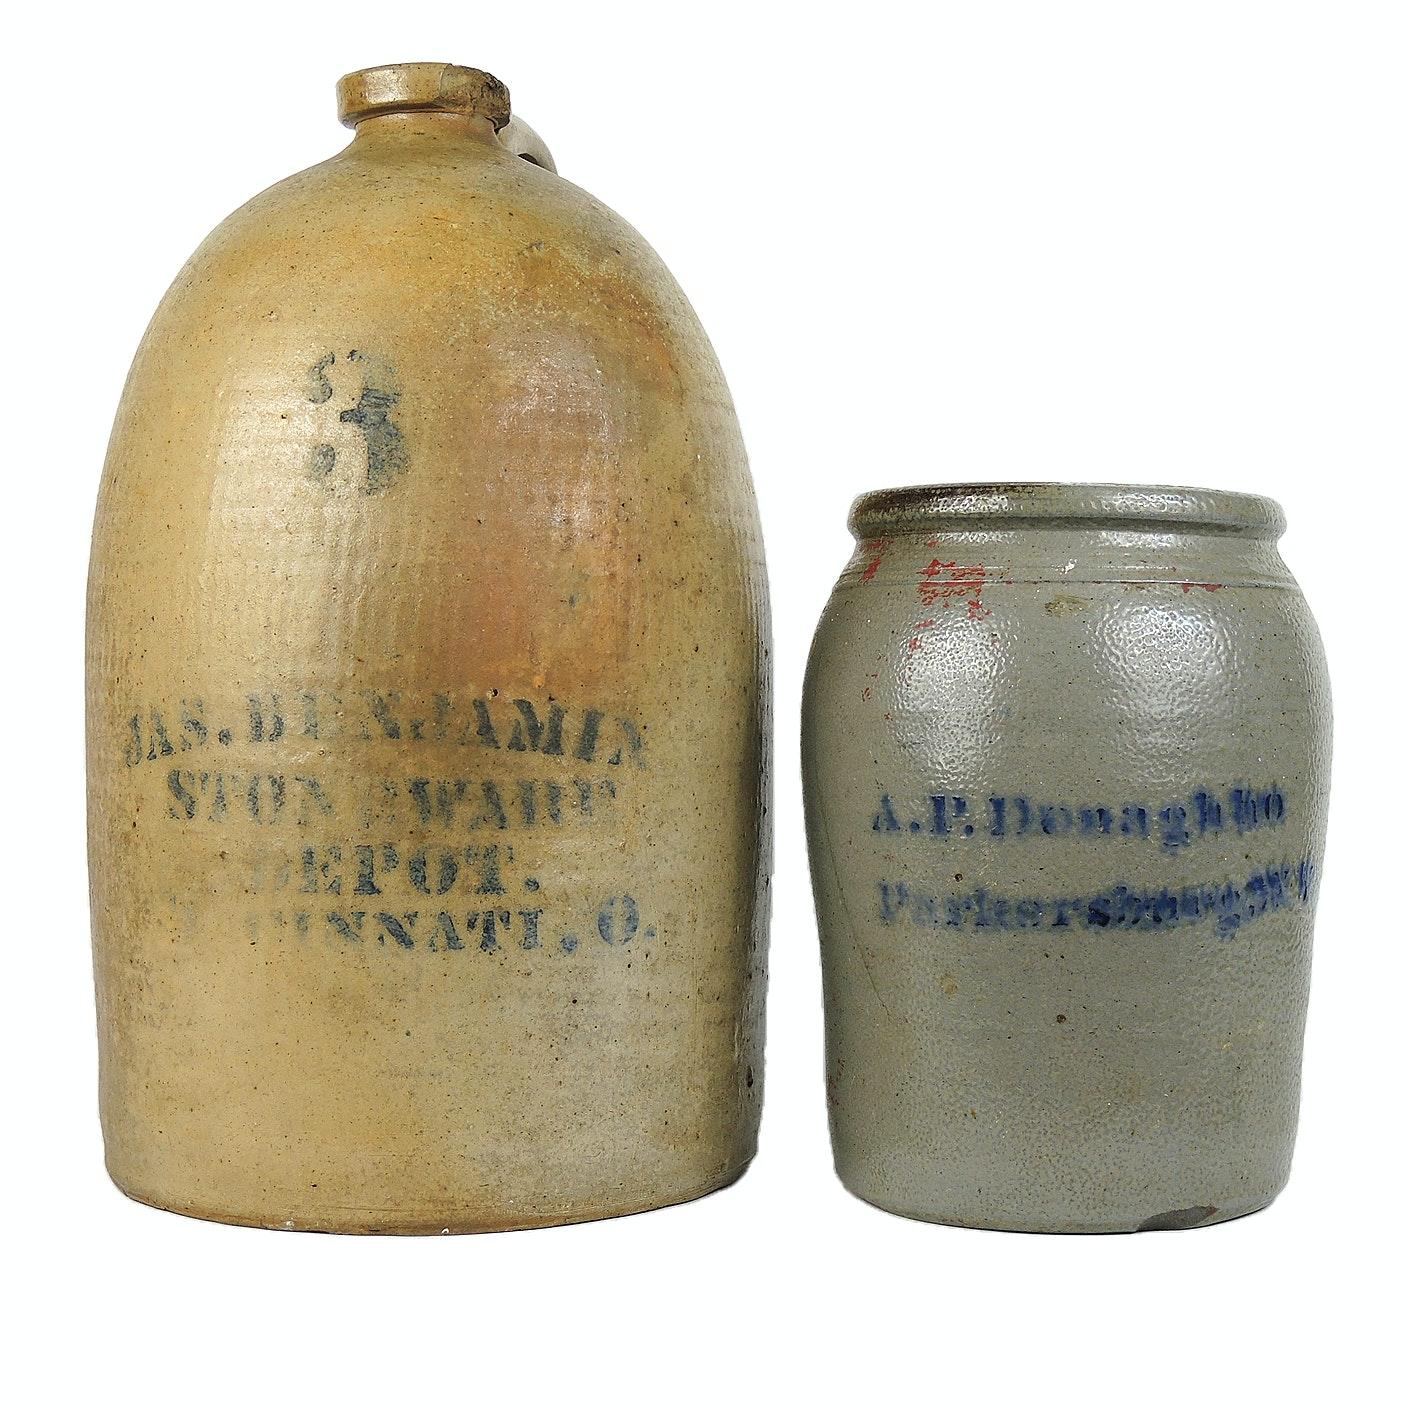 A.P. Donaghho and JAS. Benjamin of Cincinnati Stoneware, 19th Century